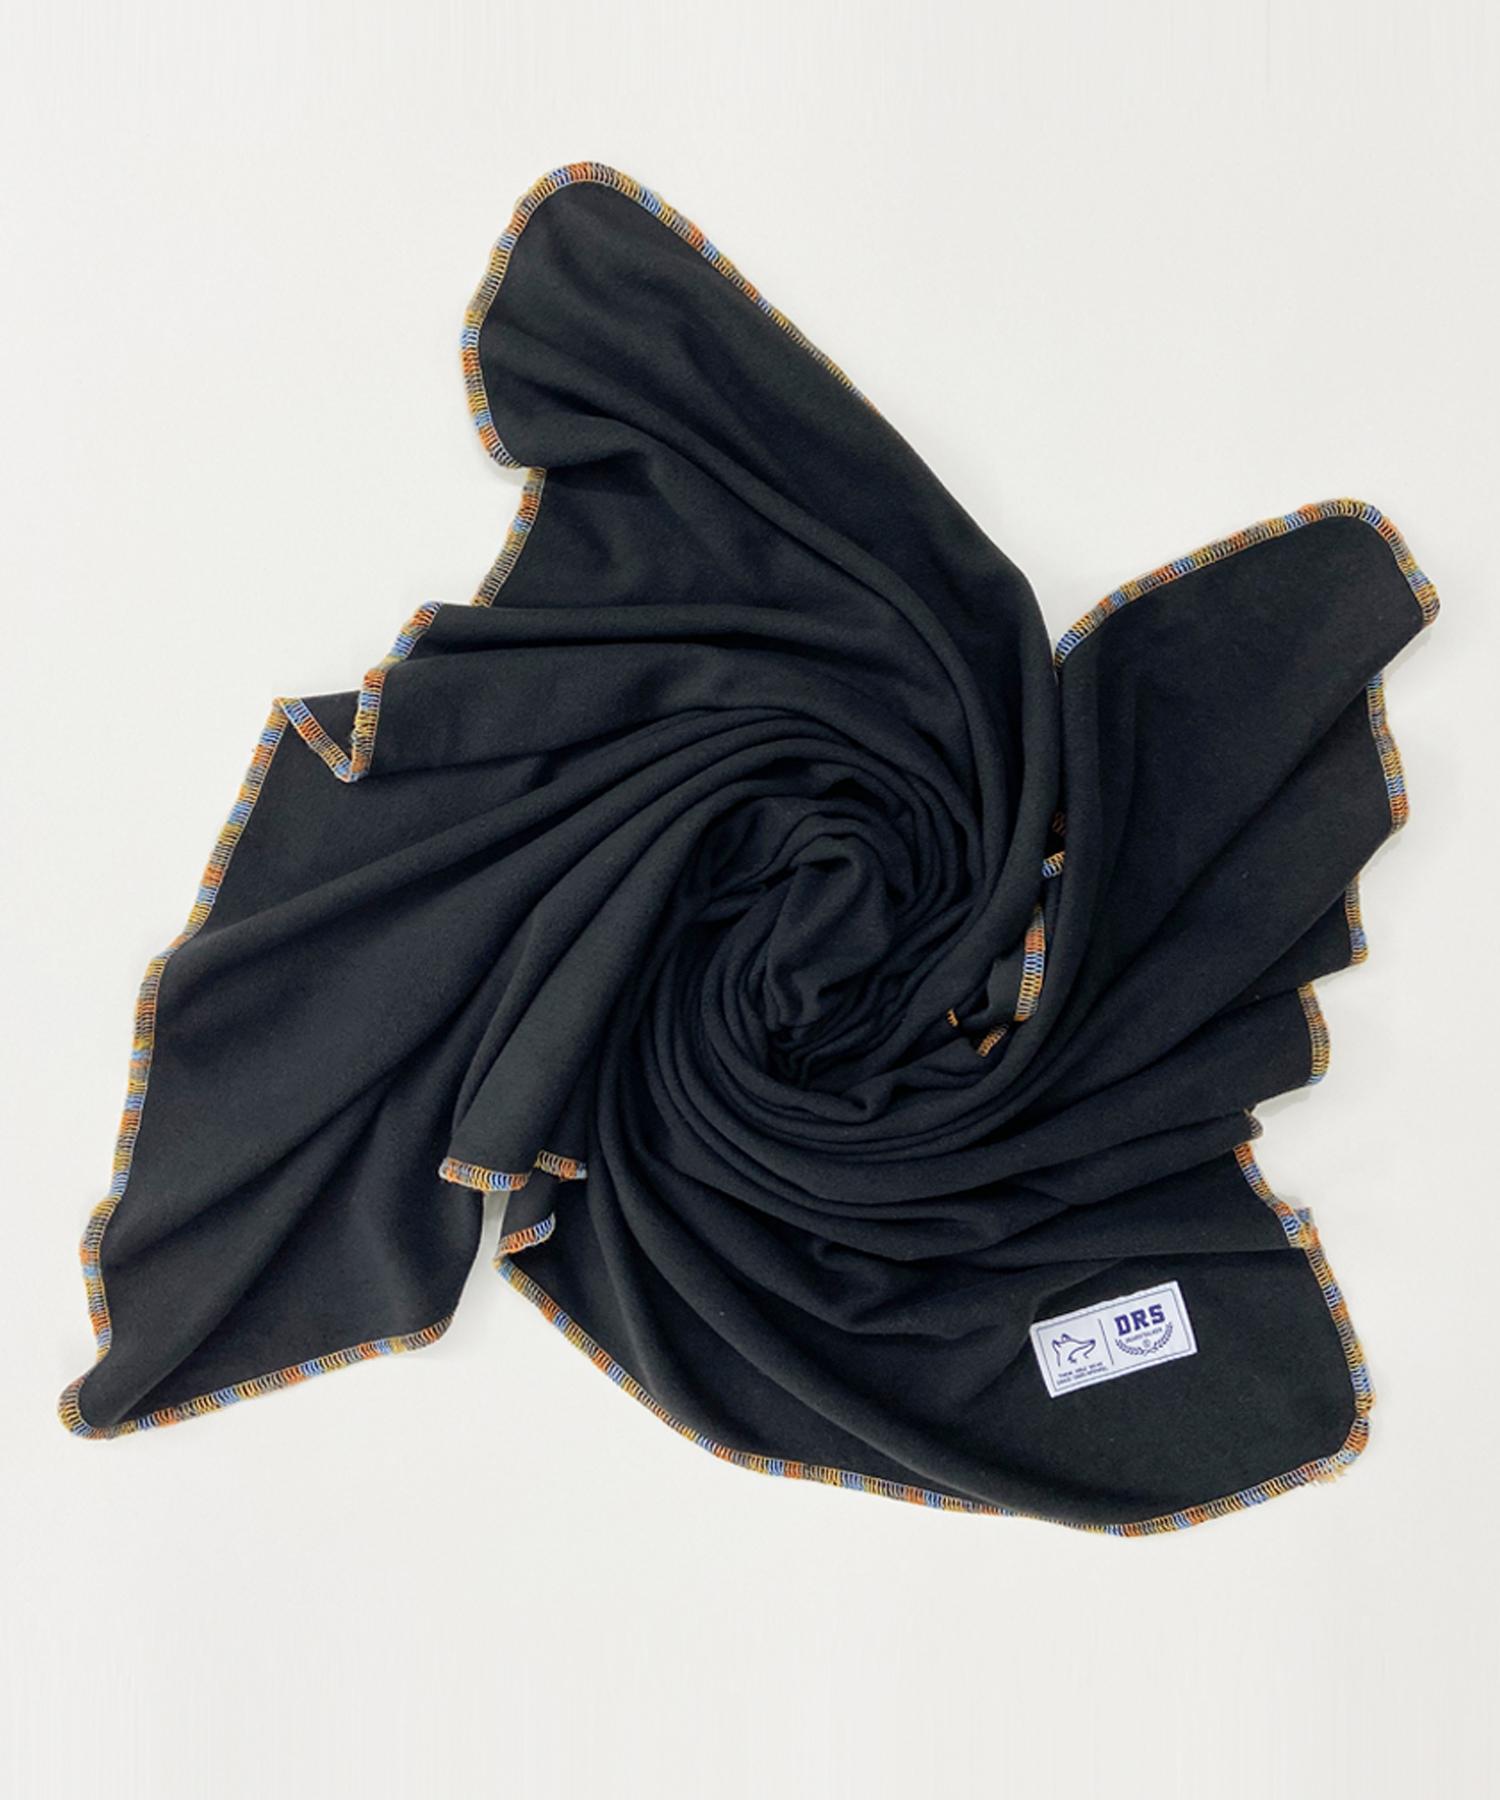 ECOLE FLEECE BLANKET (에콜 플리스 블랭킷) - BLACK